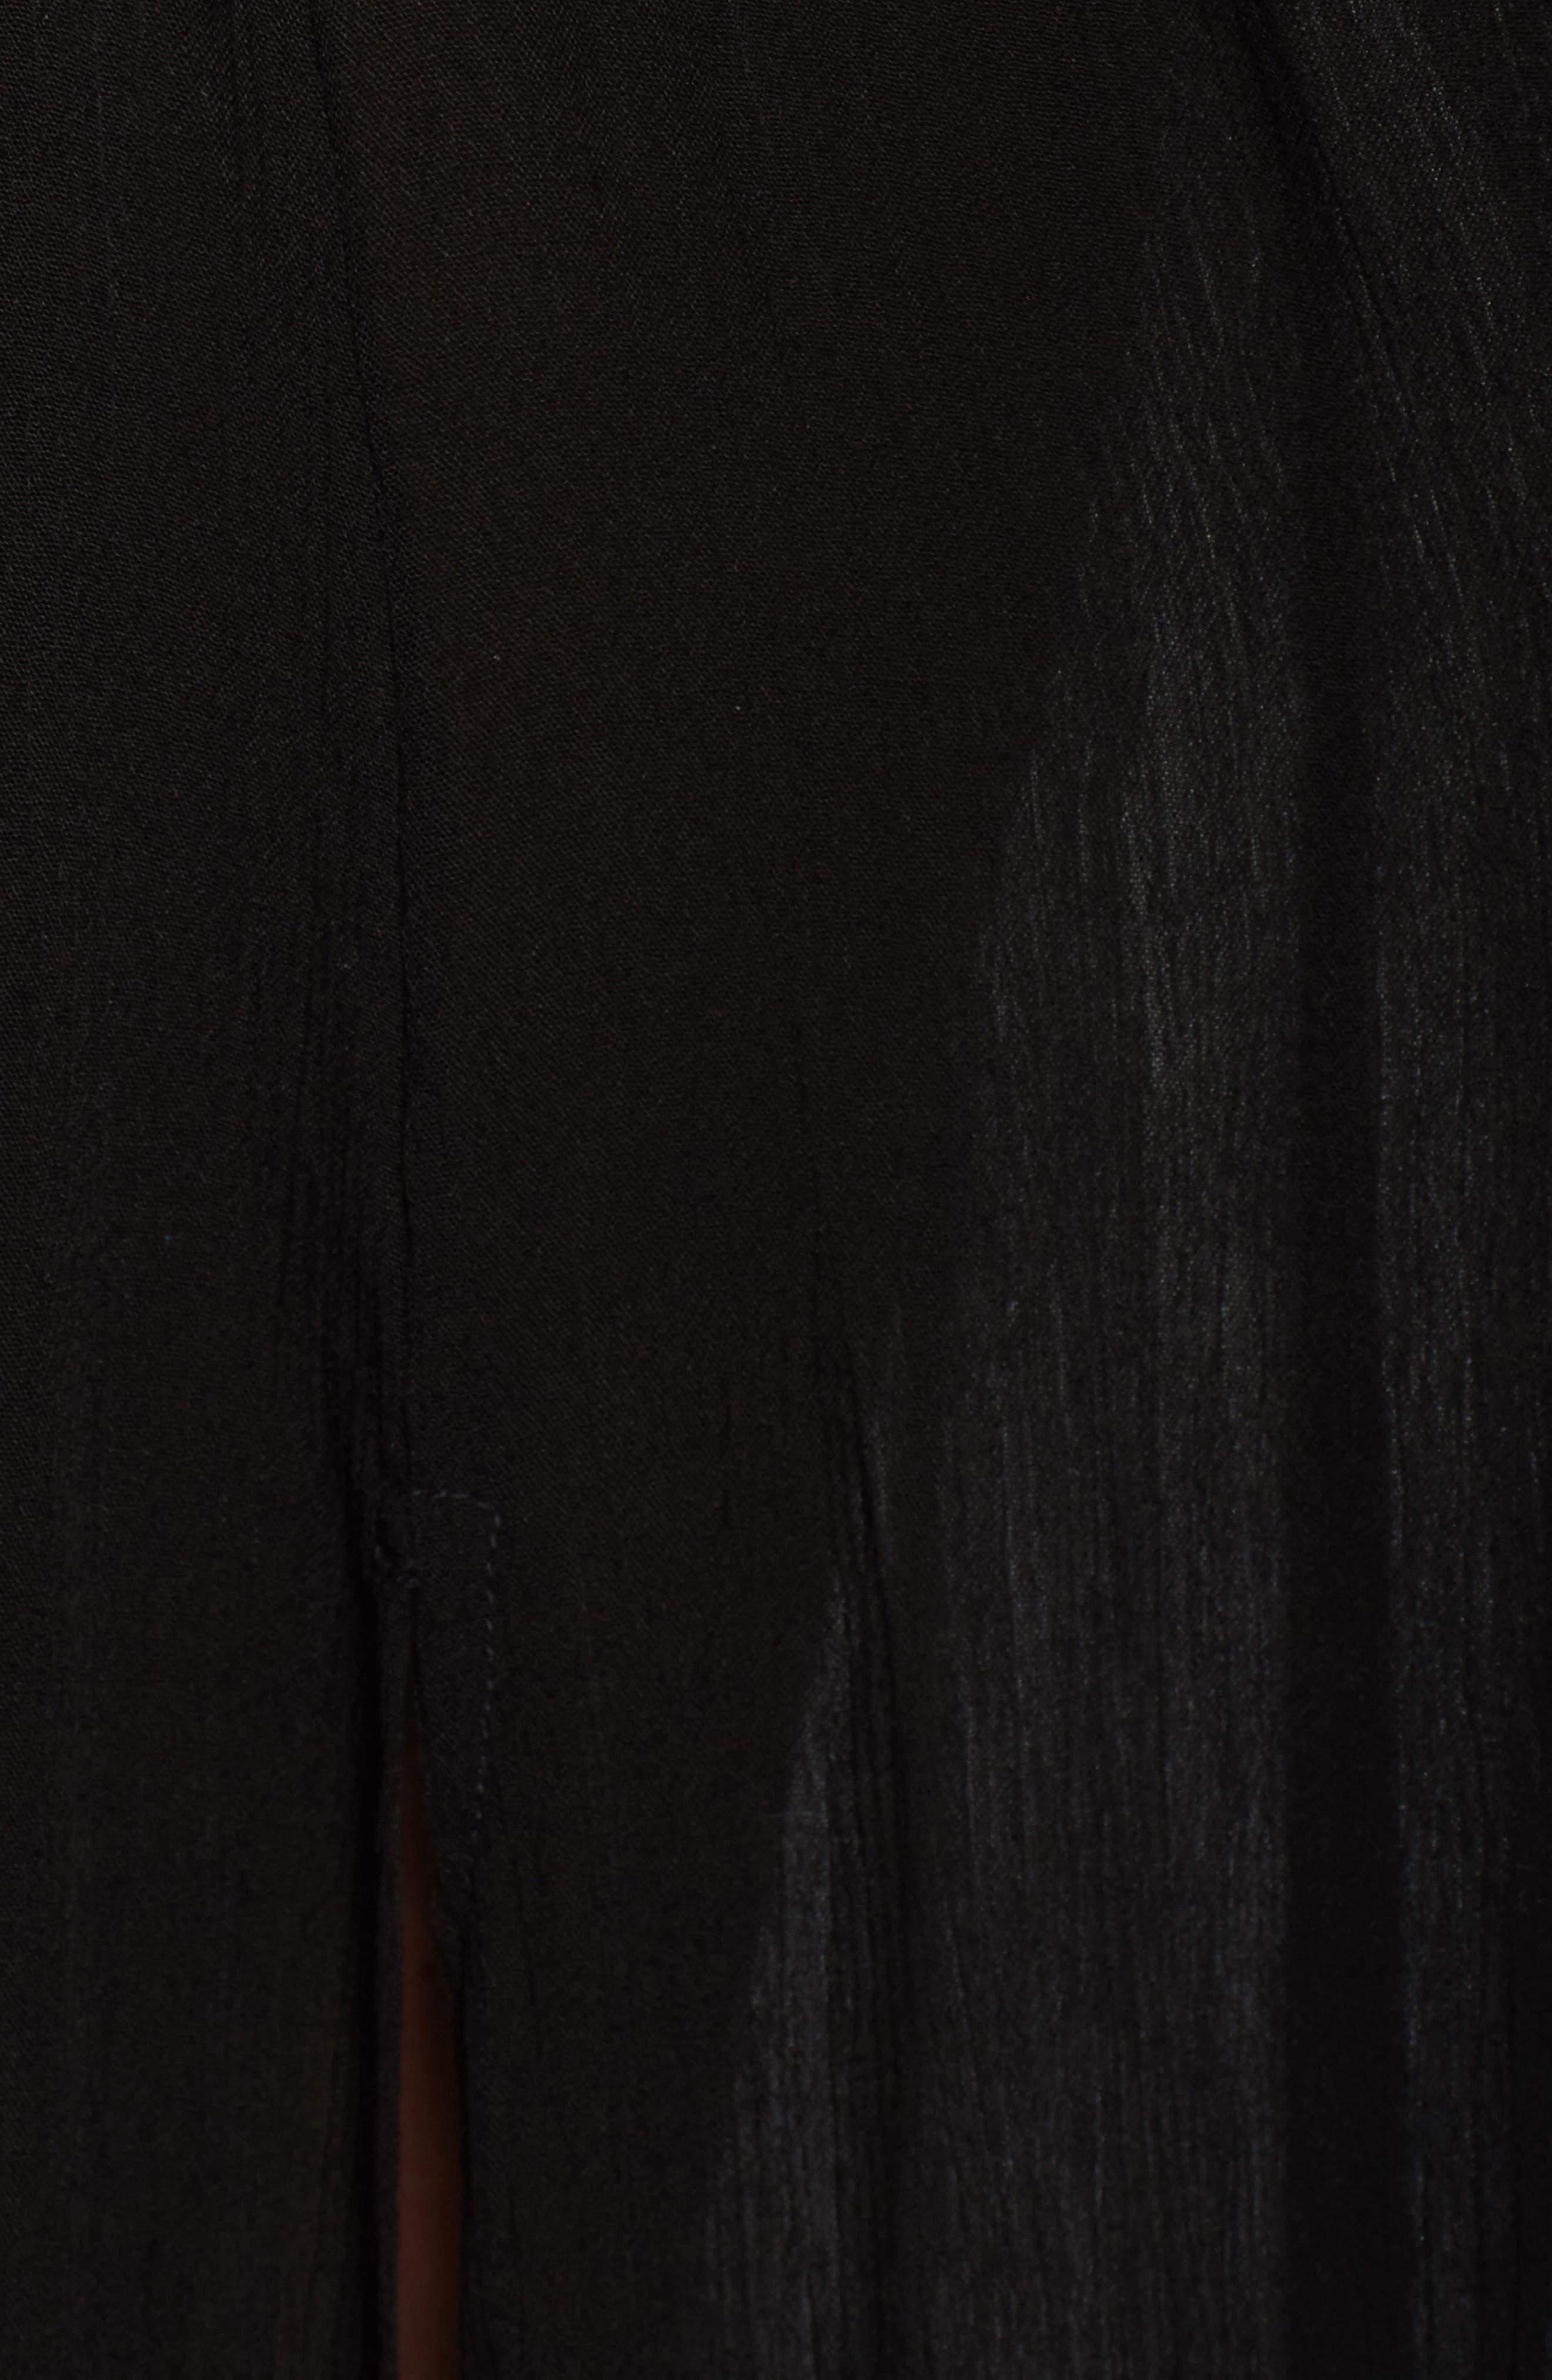 Cutout Maxi Cover-Up Dress,                             Alternate thumbnail 5, color,                             001